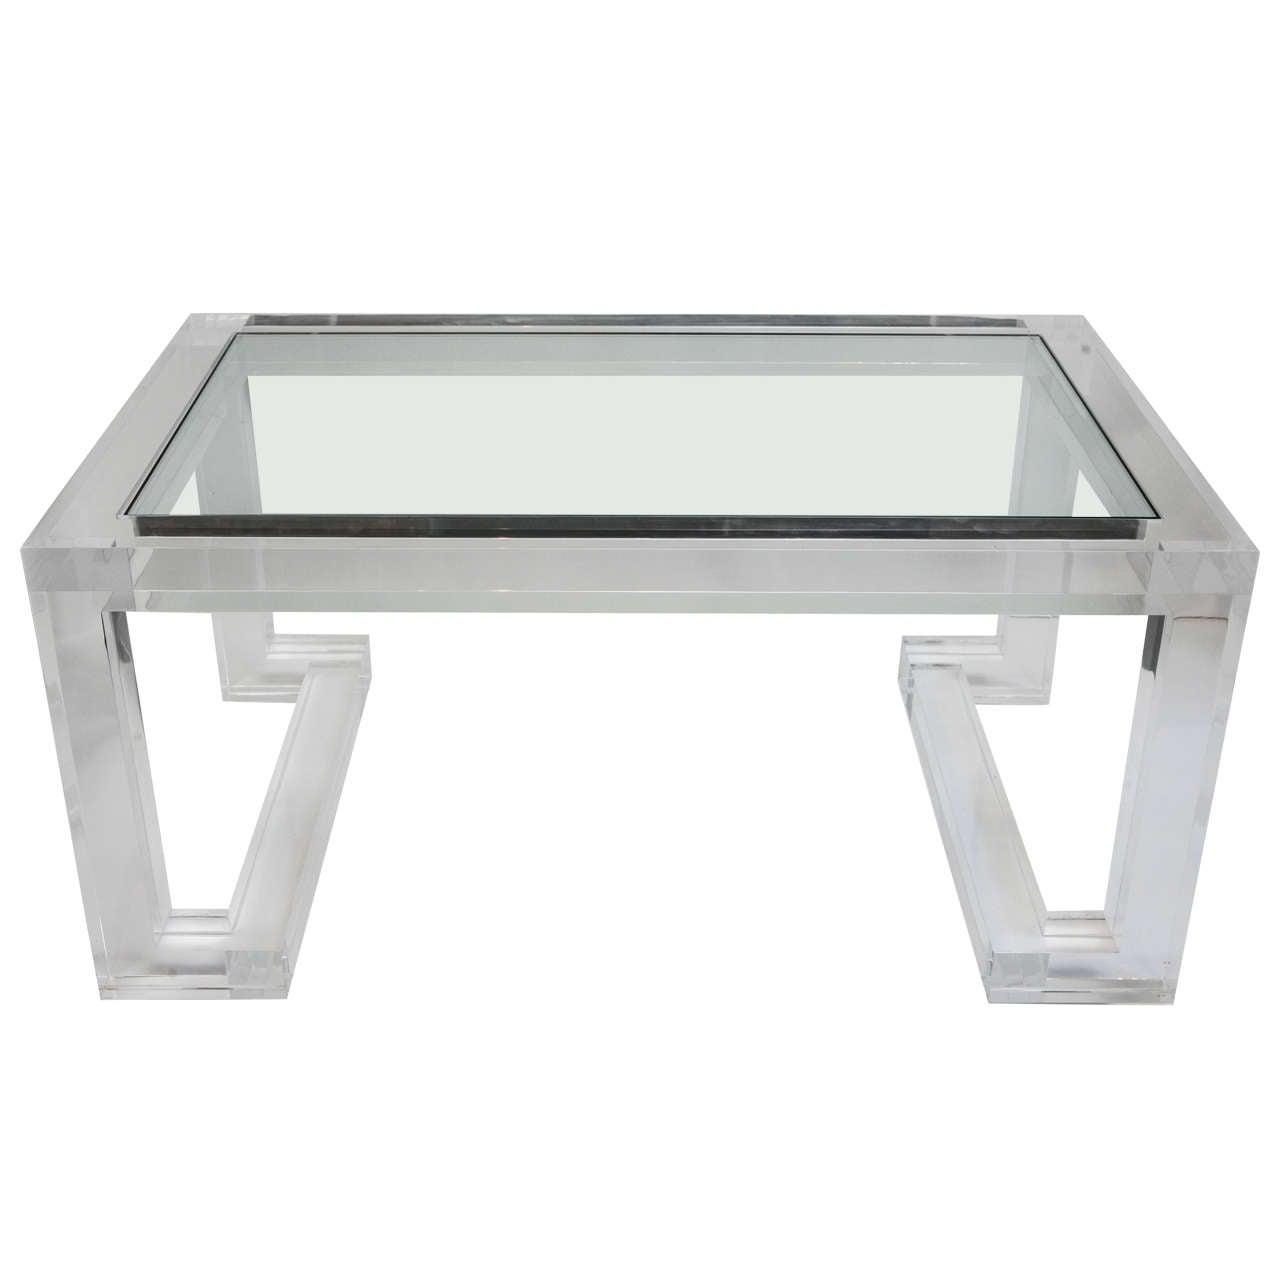 Acrylic And Glass Coffee Table: Acrylic And Glass Coffee Table At 1stdibs